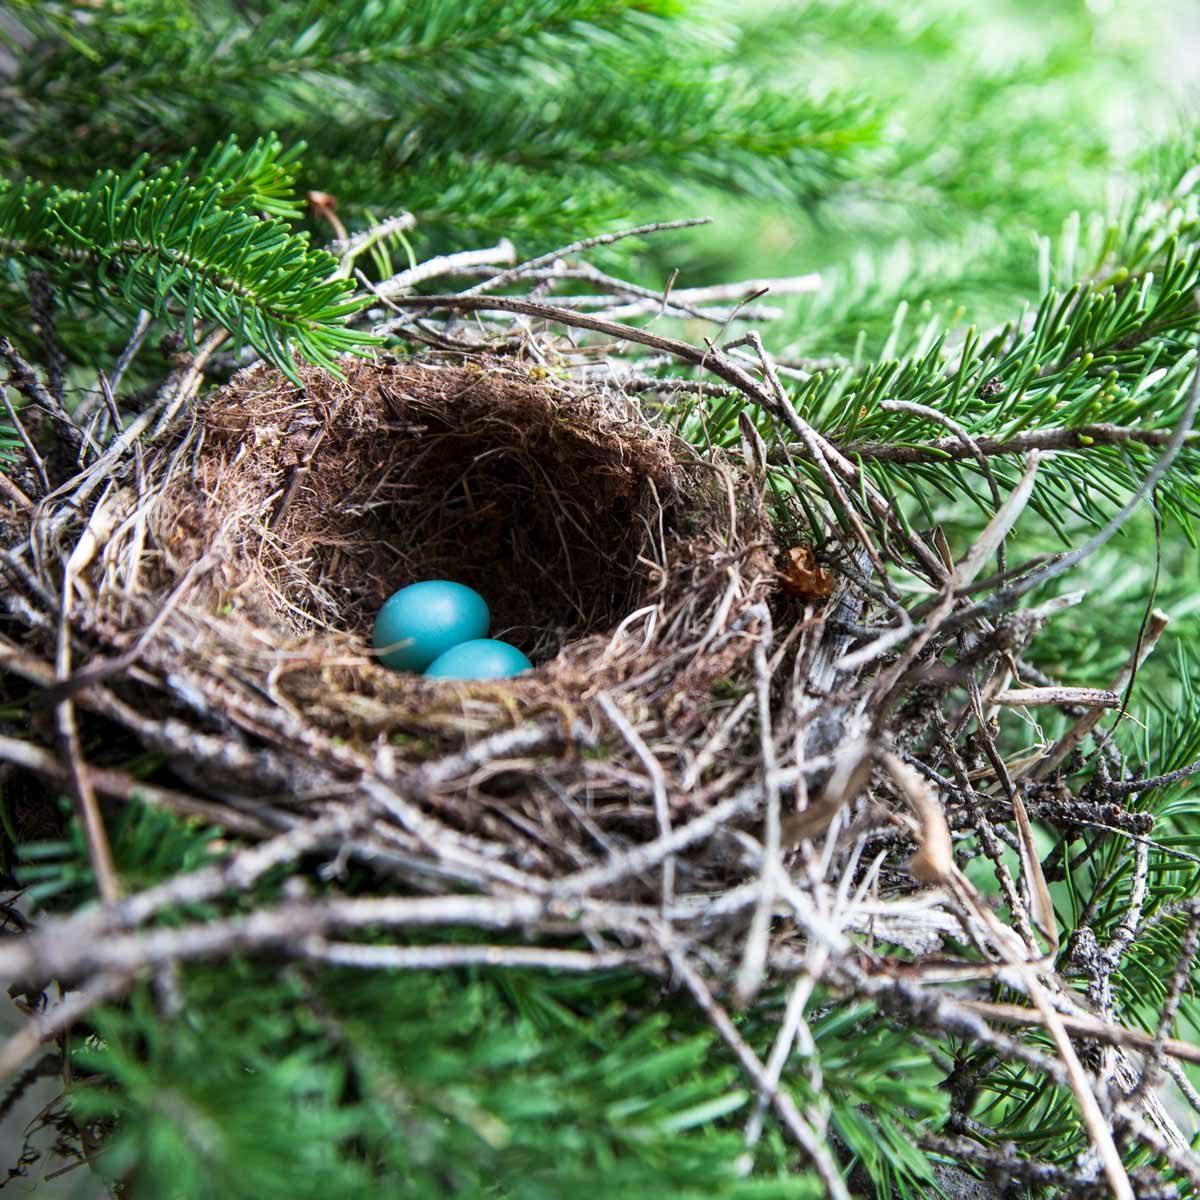 Bird eggs in a nest